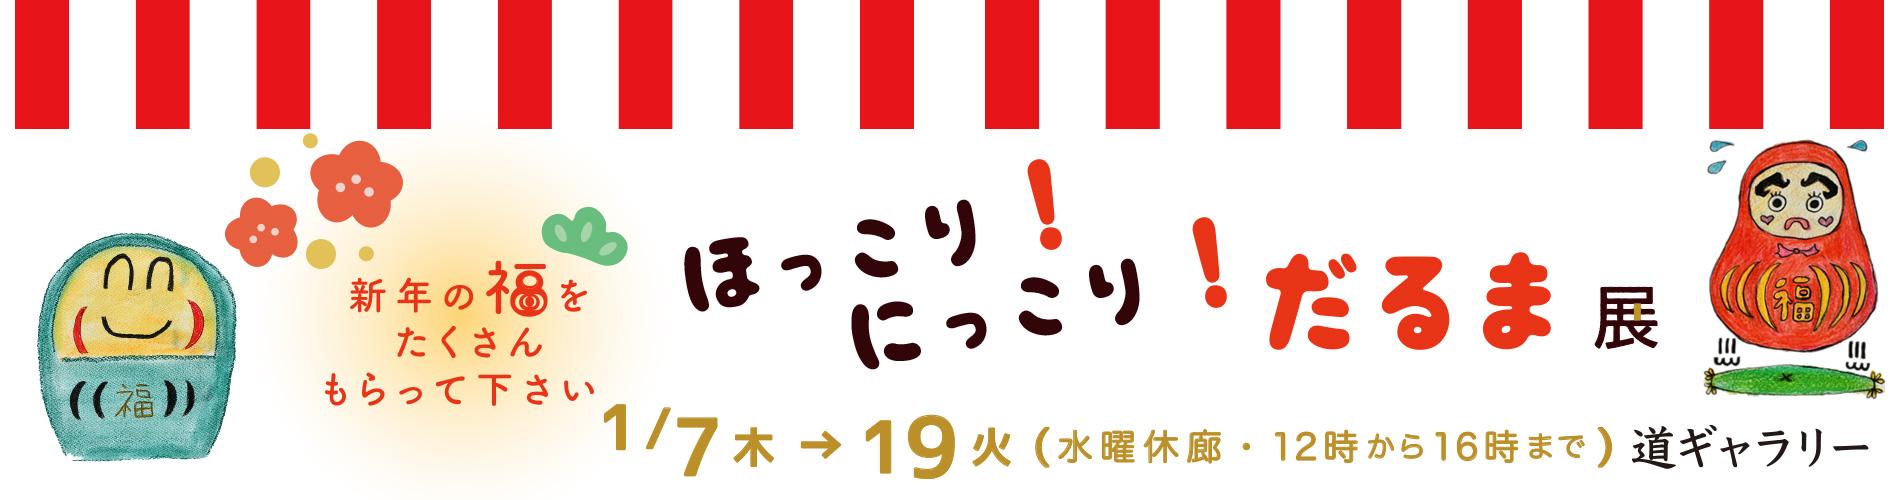 http://kamakura-michi.com/category/道ギャラリー/